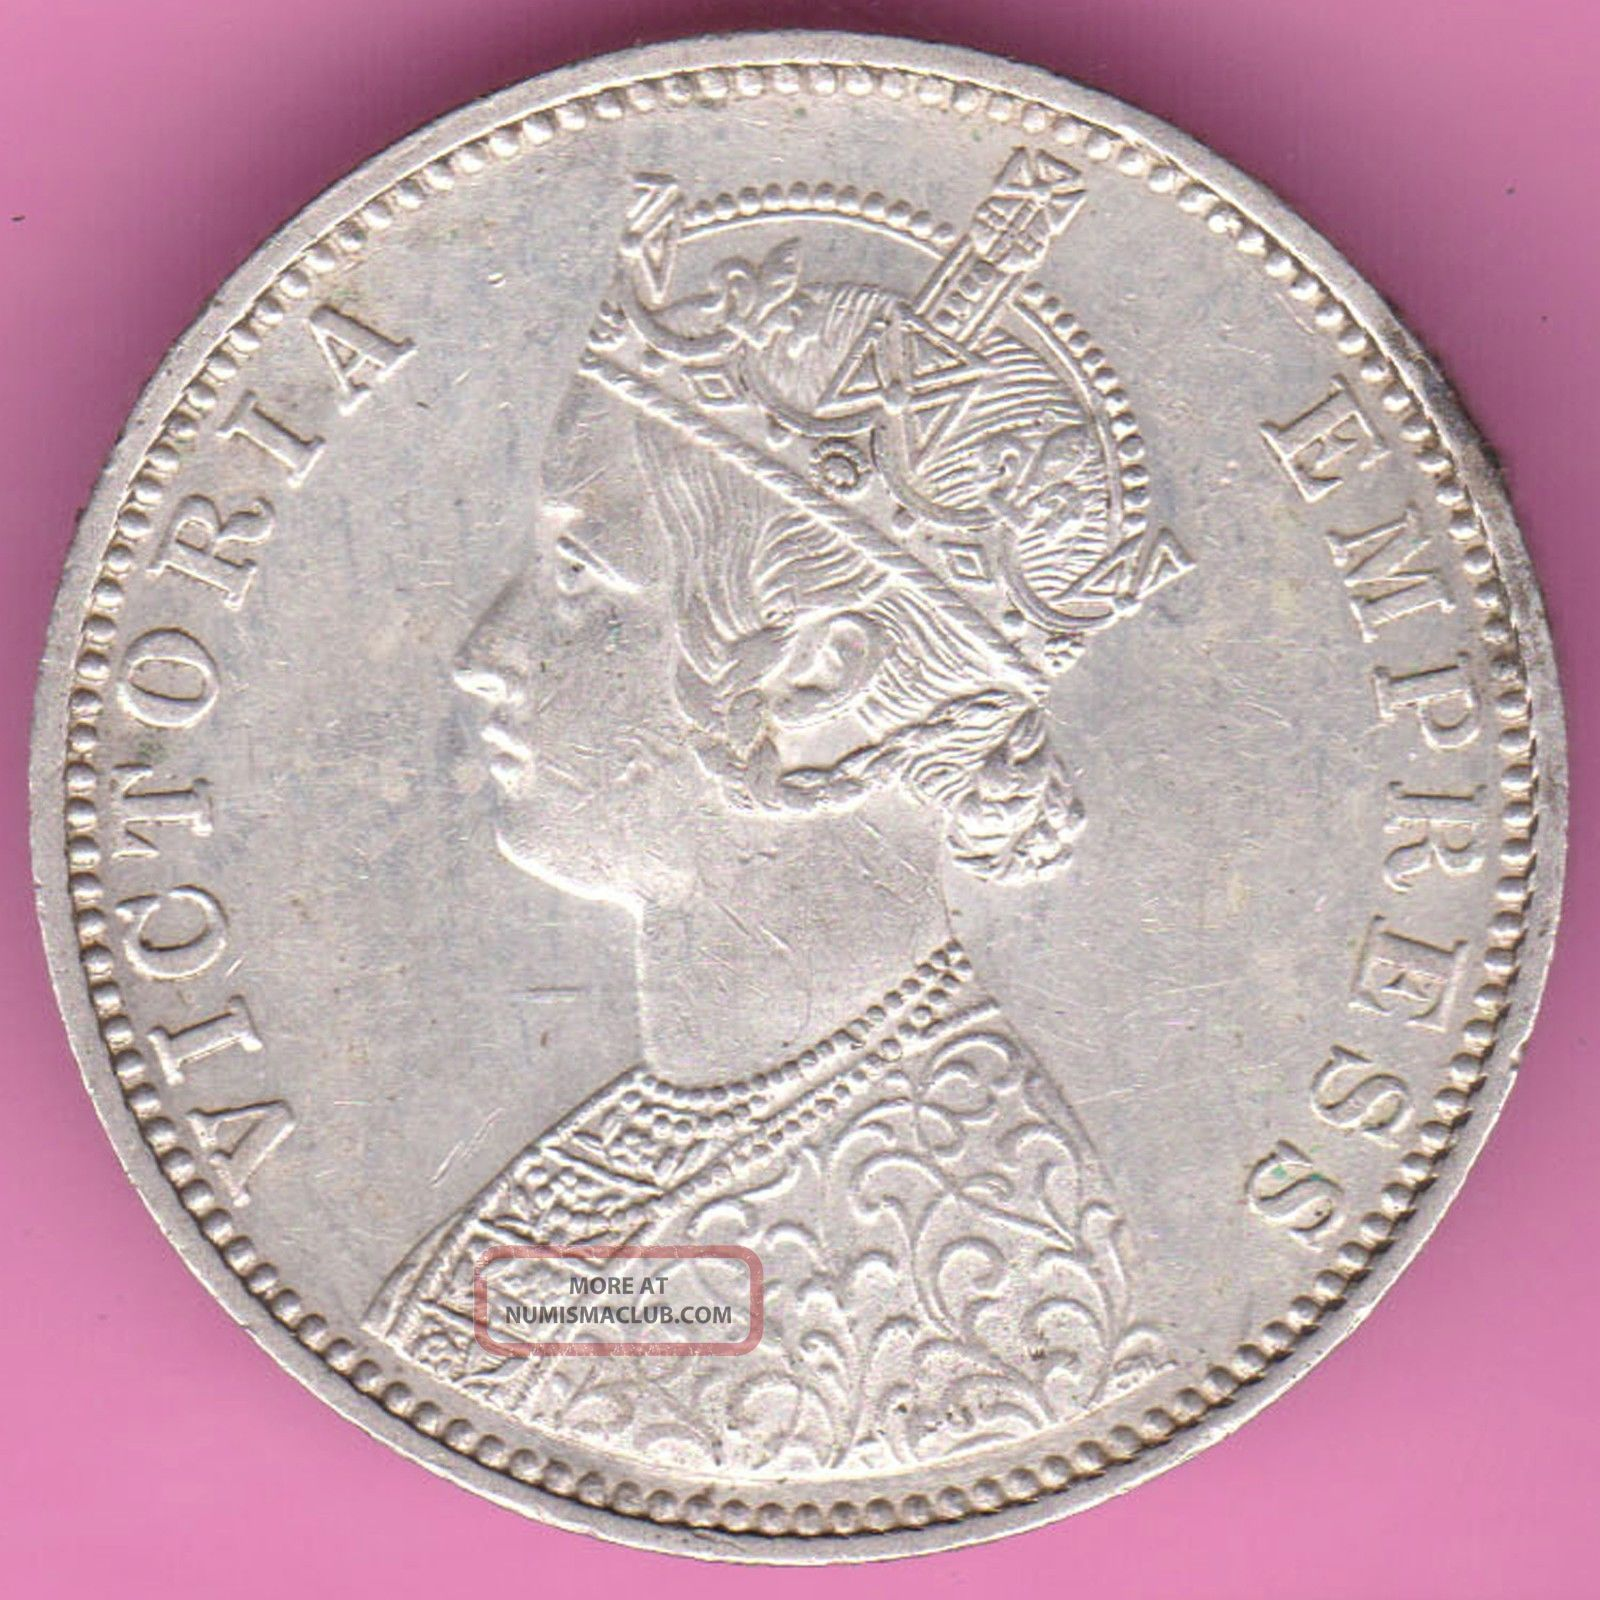 British India - 1901 - Victoria Queen - One Rupee - Rarest Silver Coin - 15 India photo